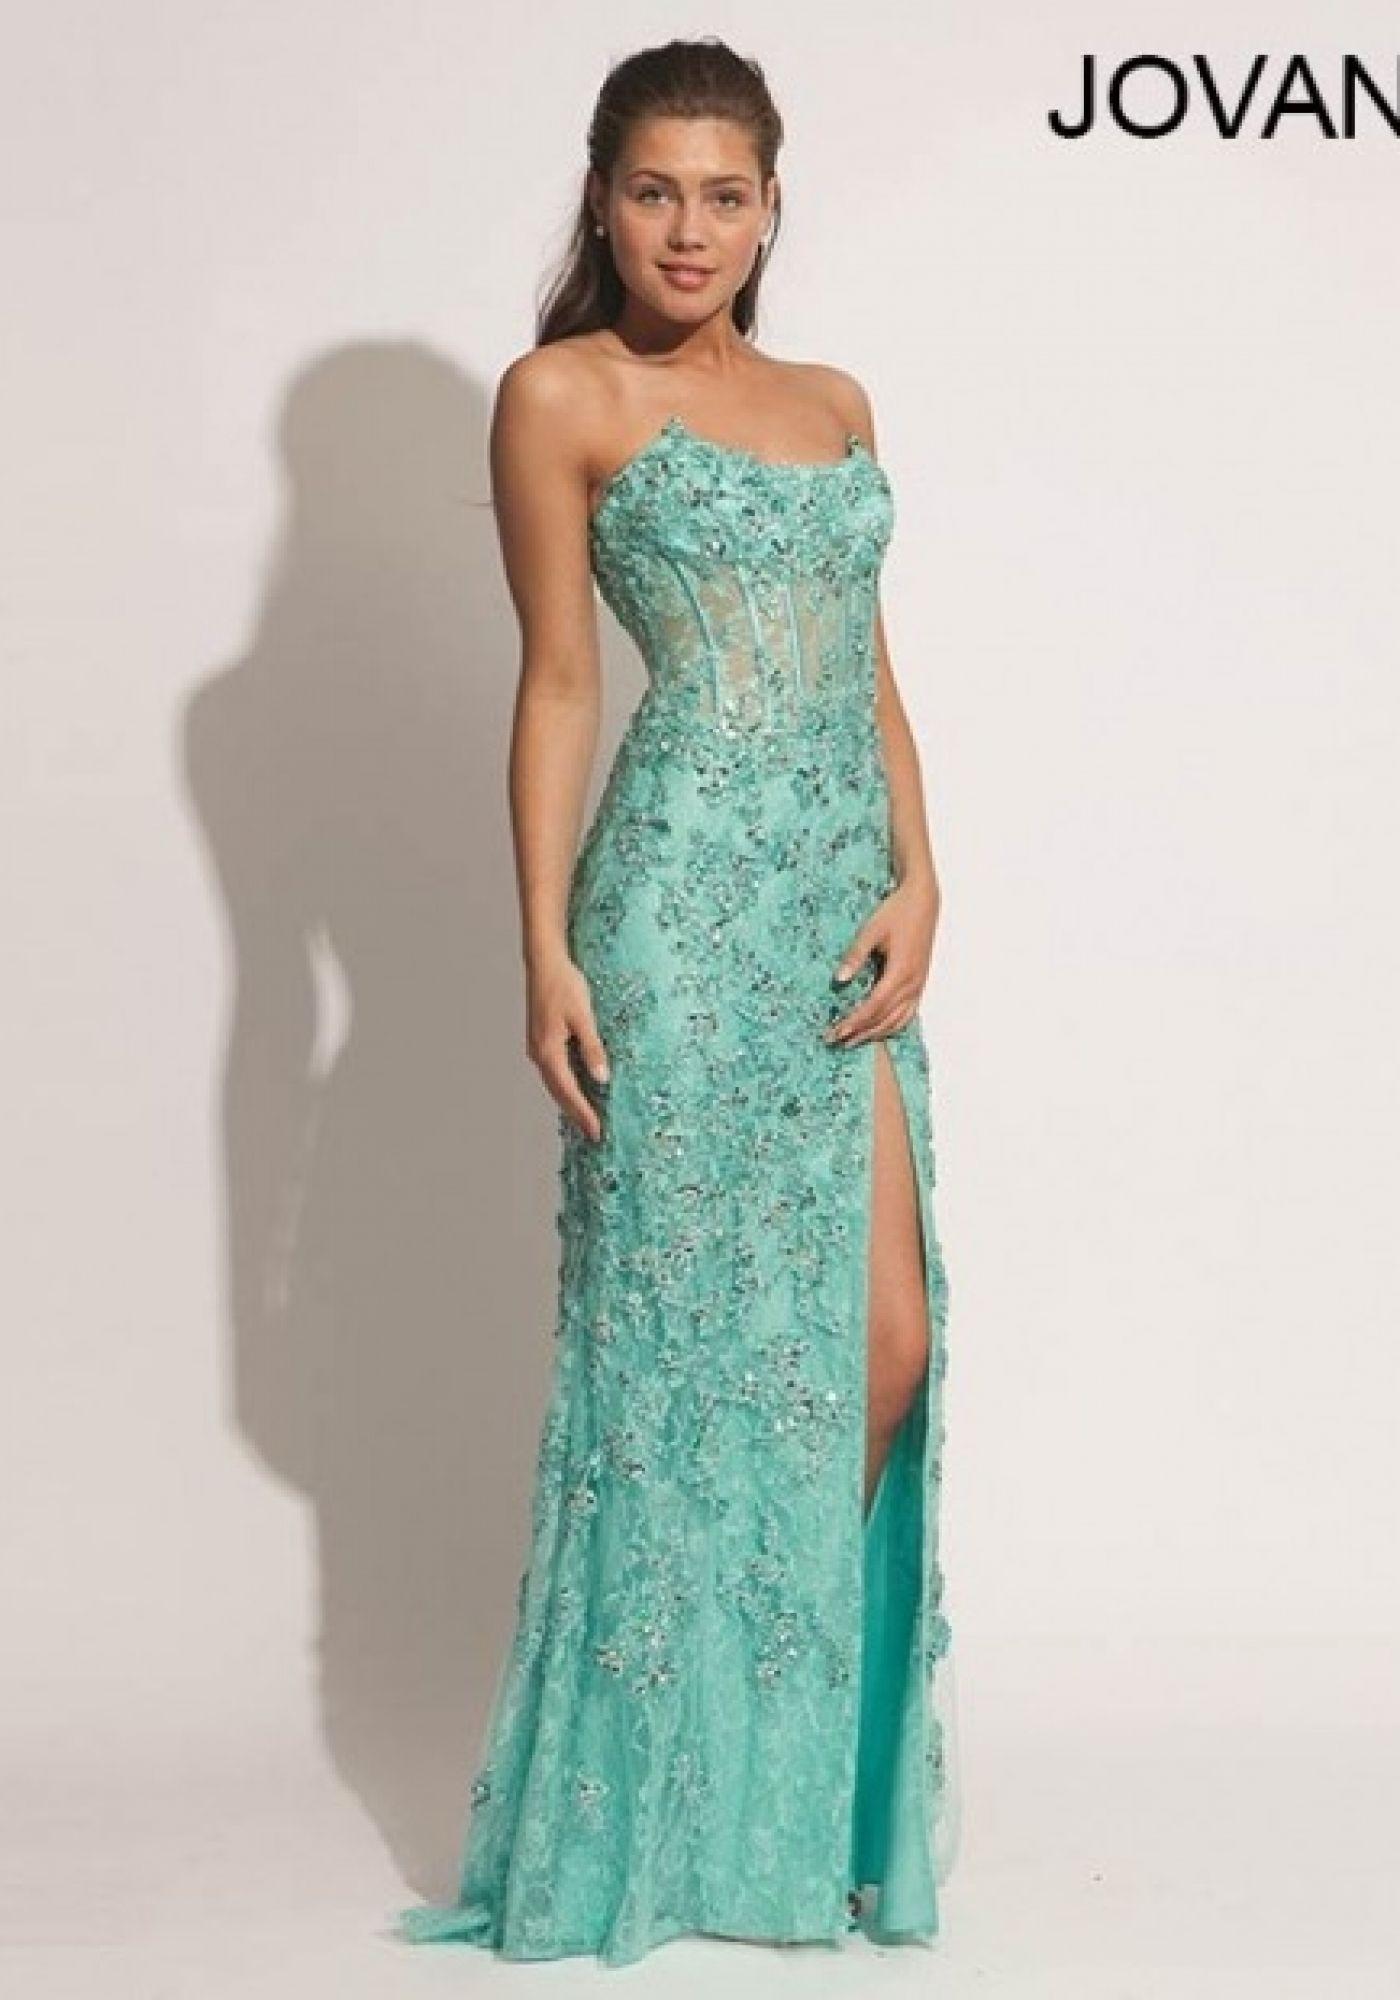 Jovani 88645 | Prom Dresses | Pinterest | Prom, Sapphire and Dress ...